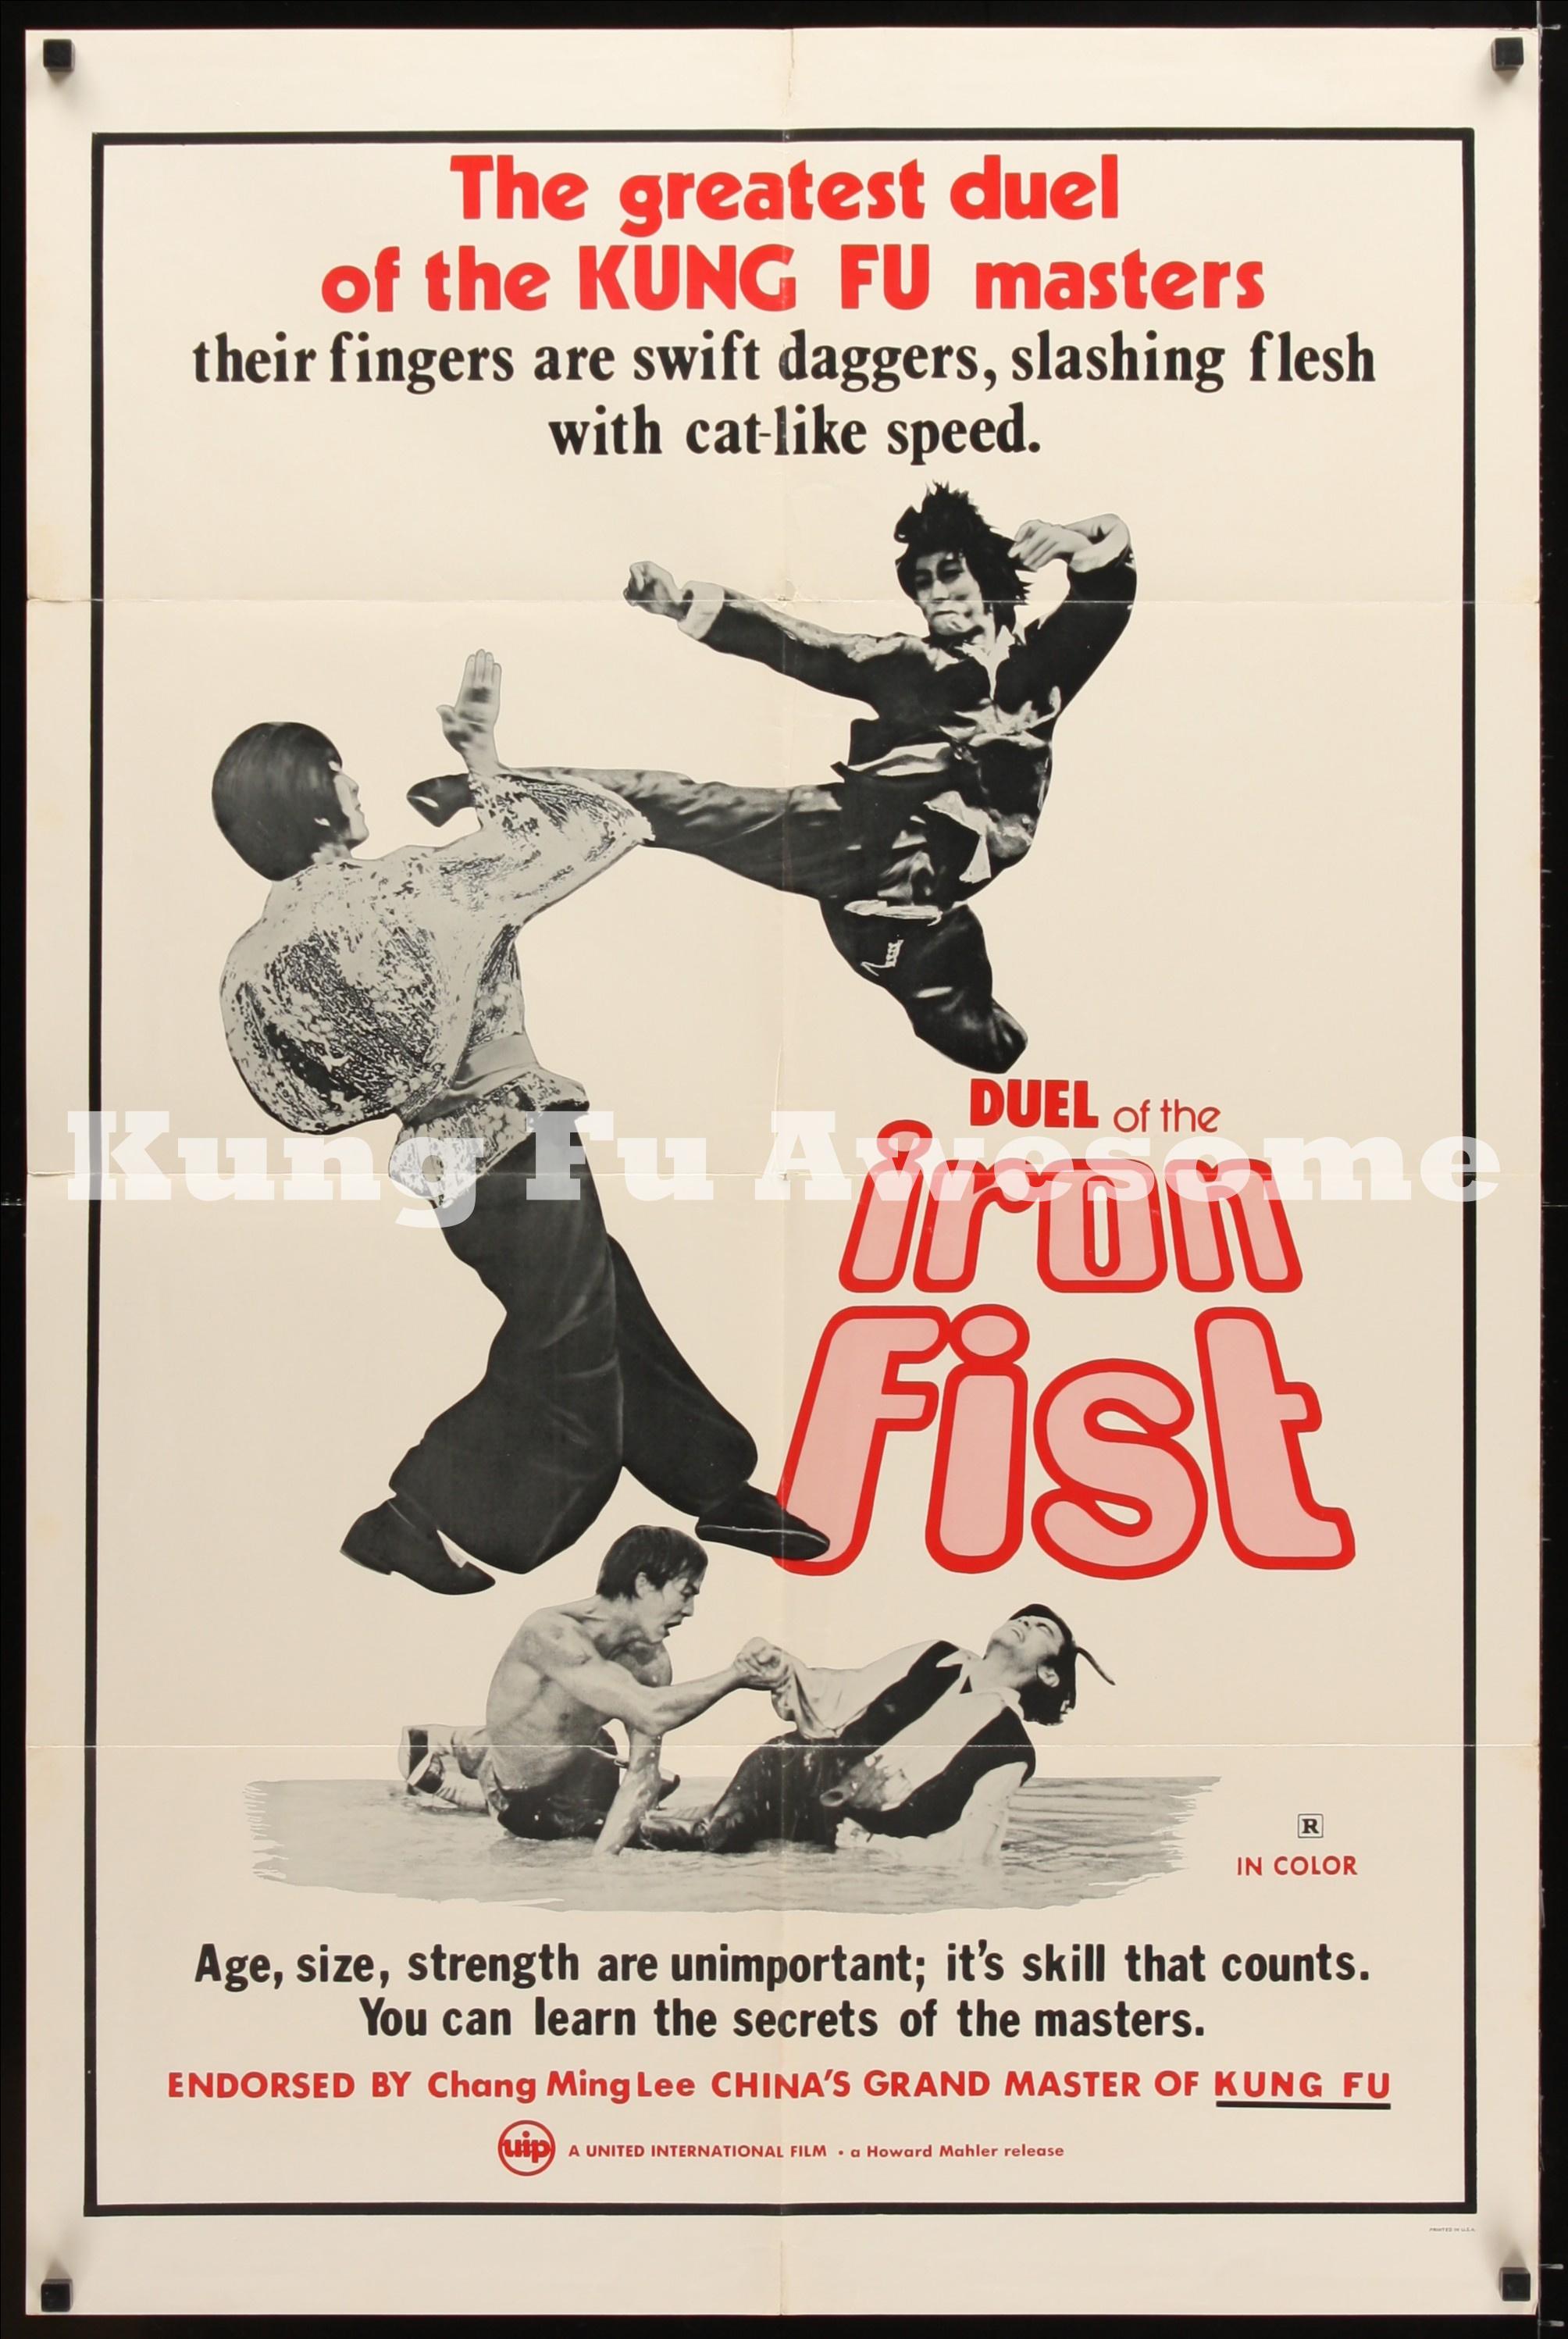 duel_of_the_iron_fist_MF00110_L.jpg